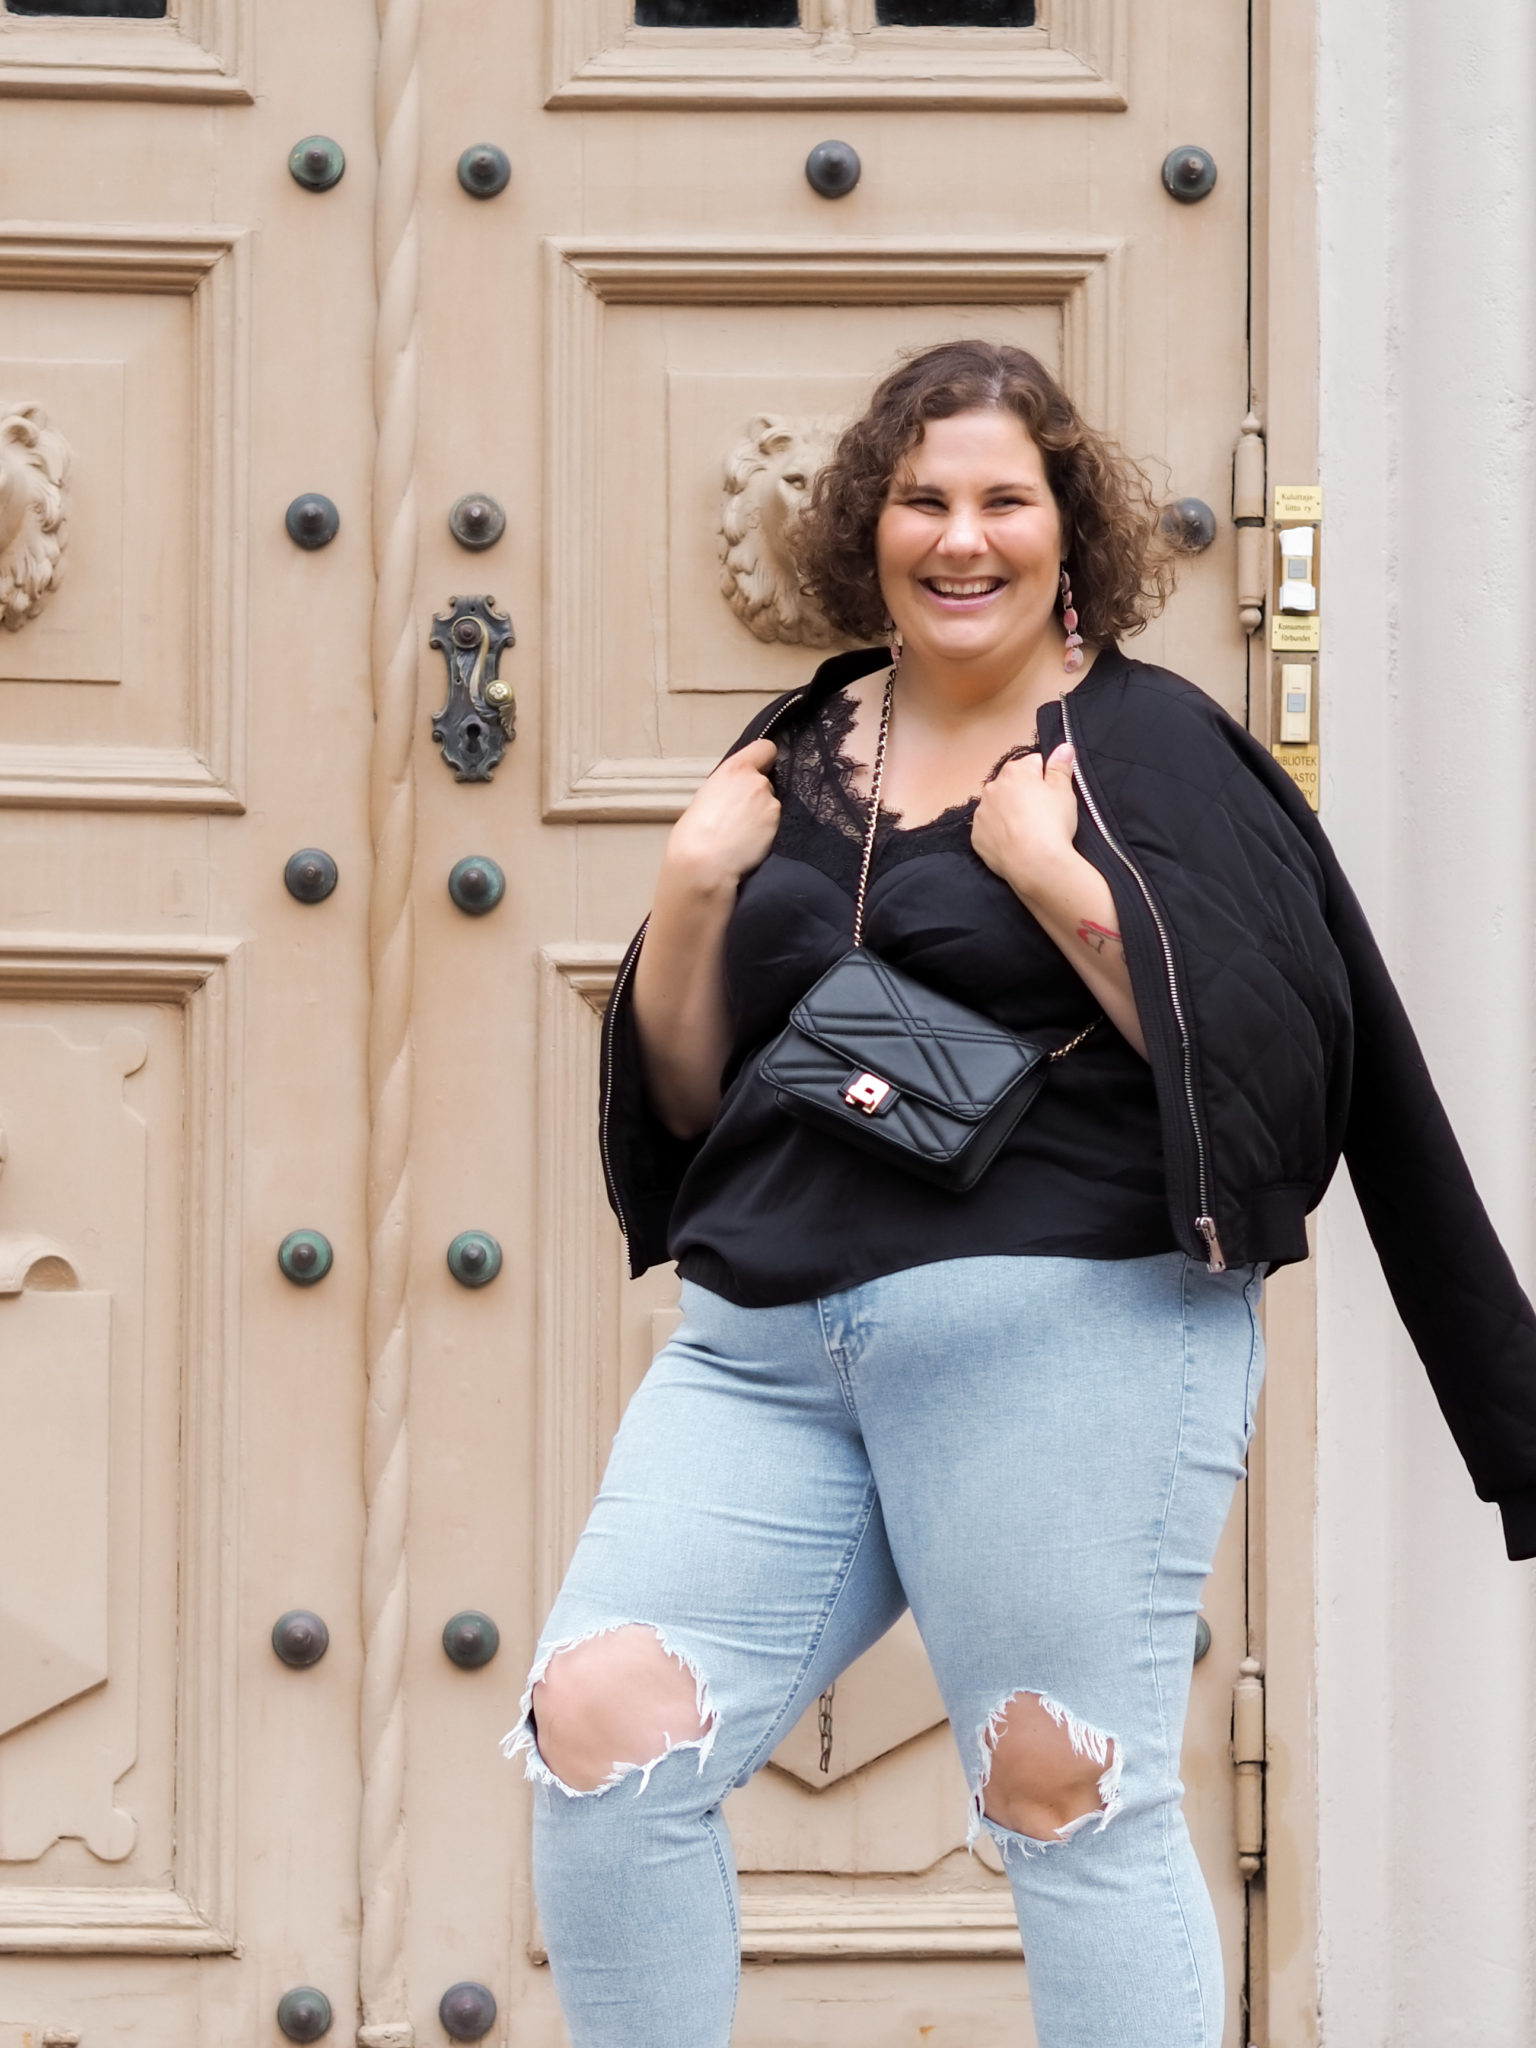 Kuvat Katri Konderla - BMH - Big mamas home by Jenni